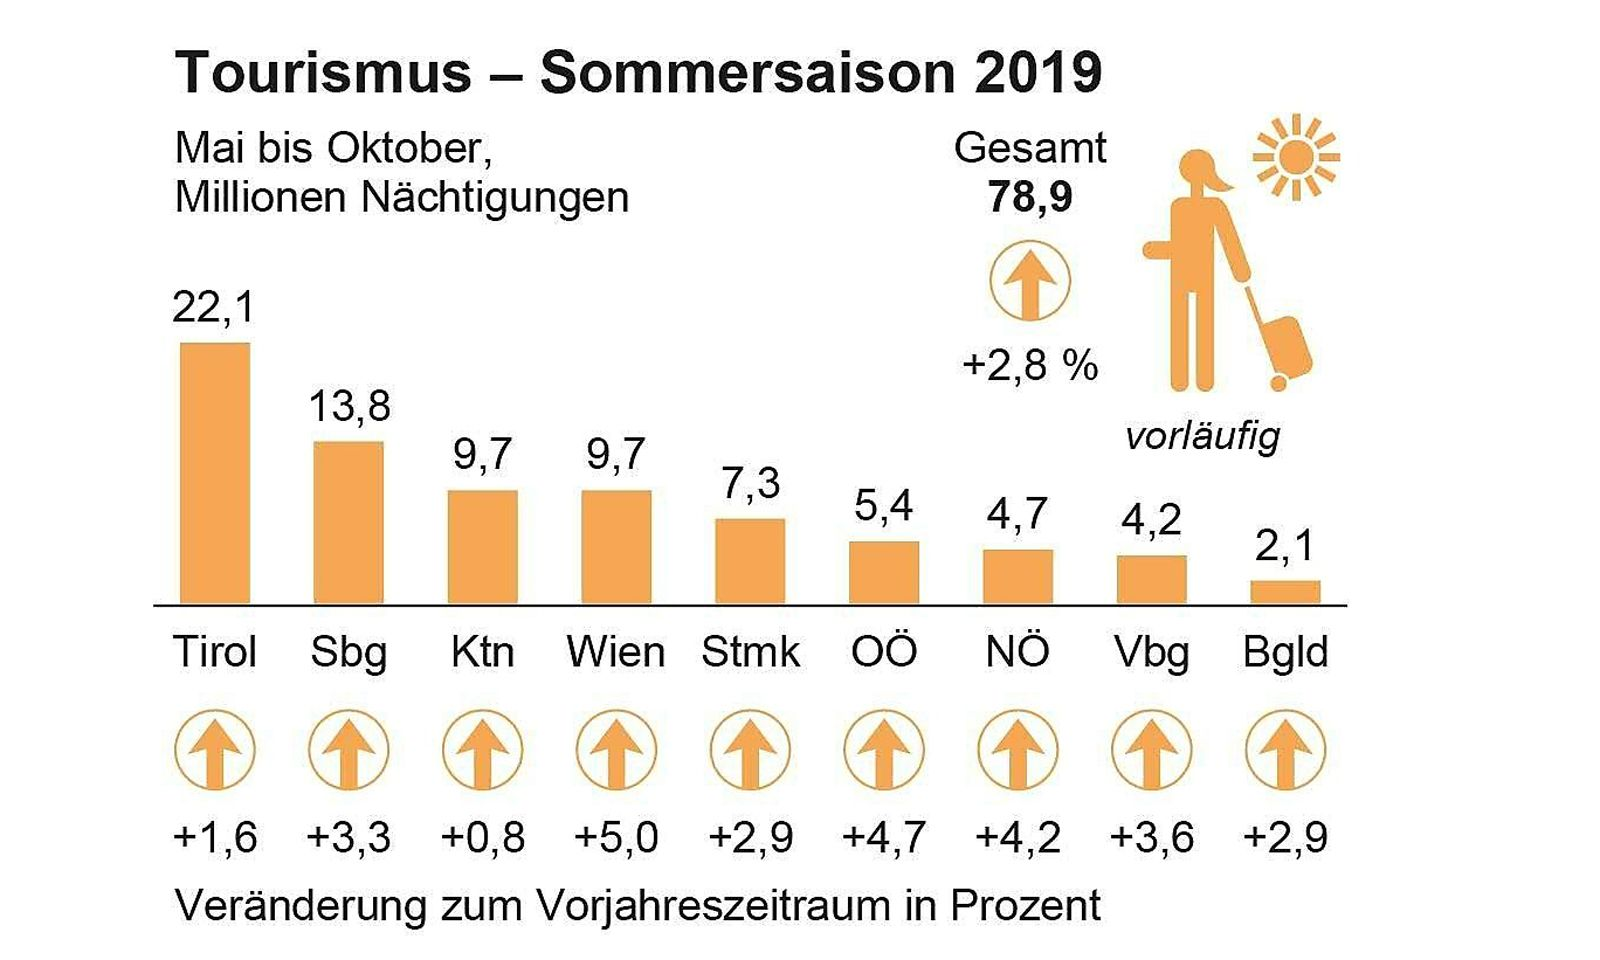 Tourismus - Sommersaison 2019